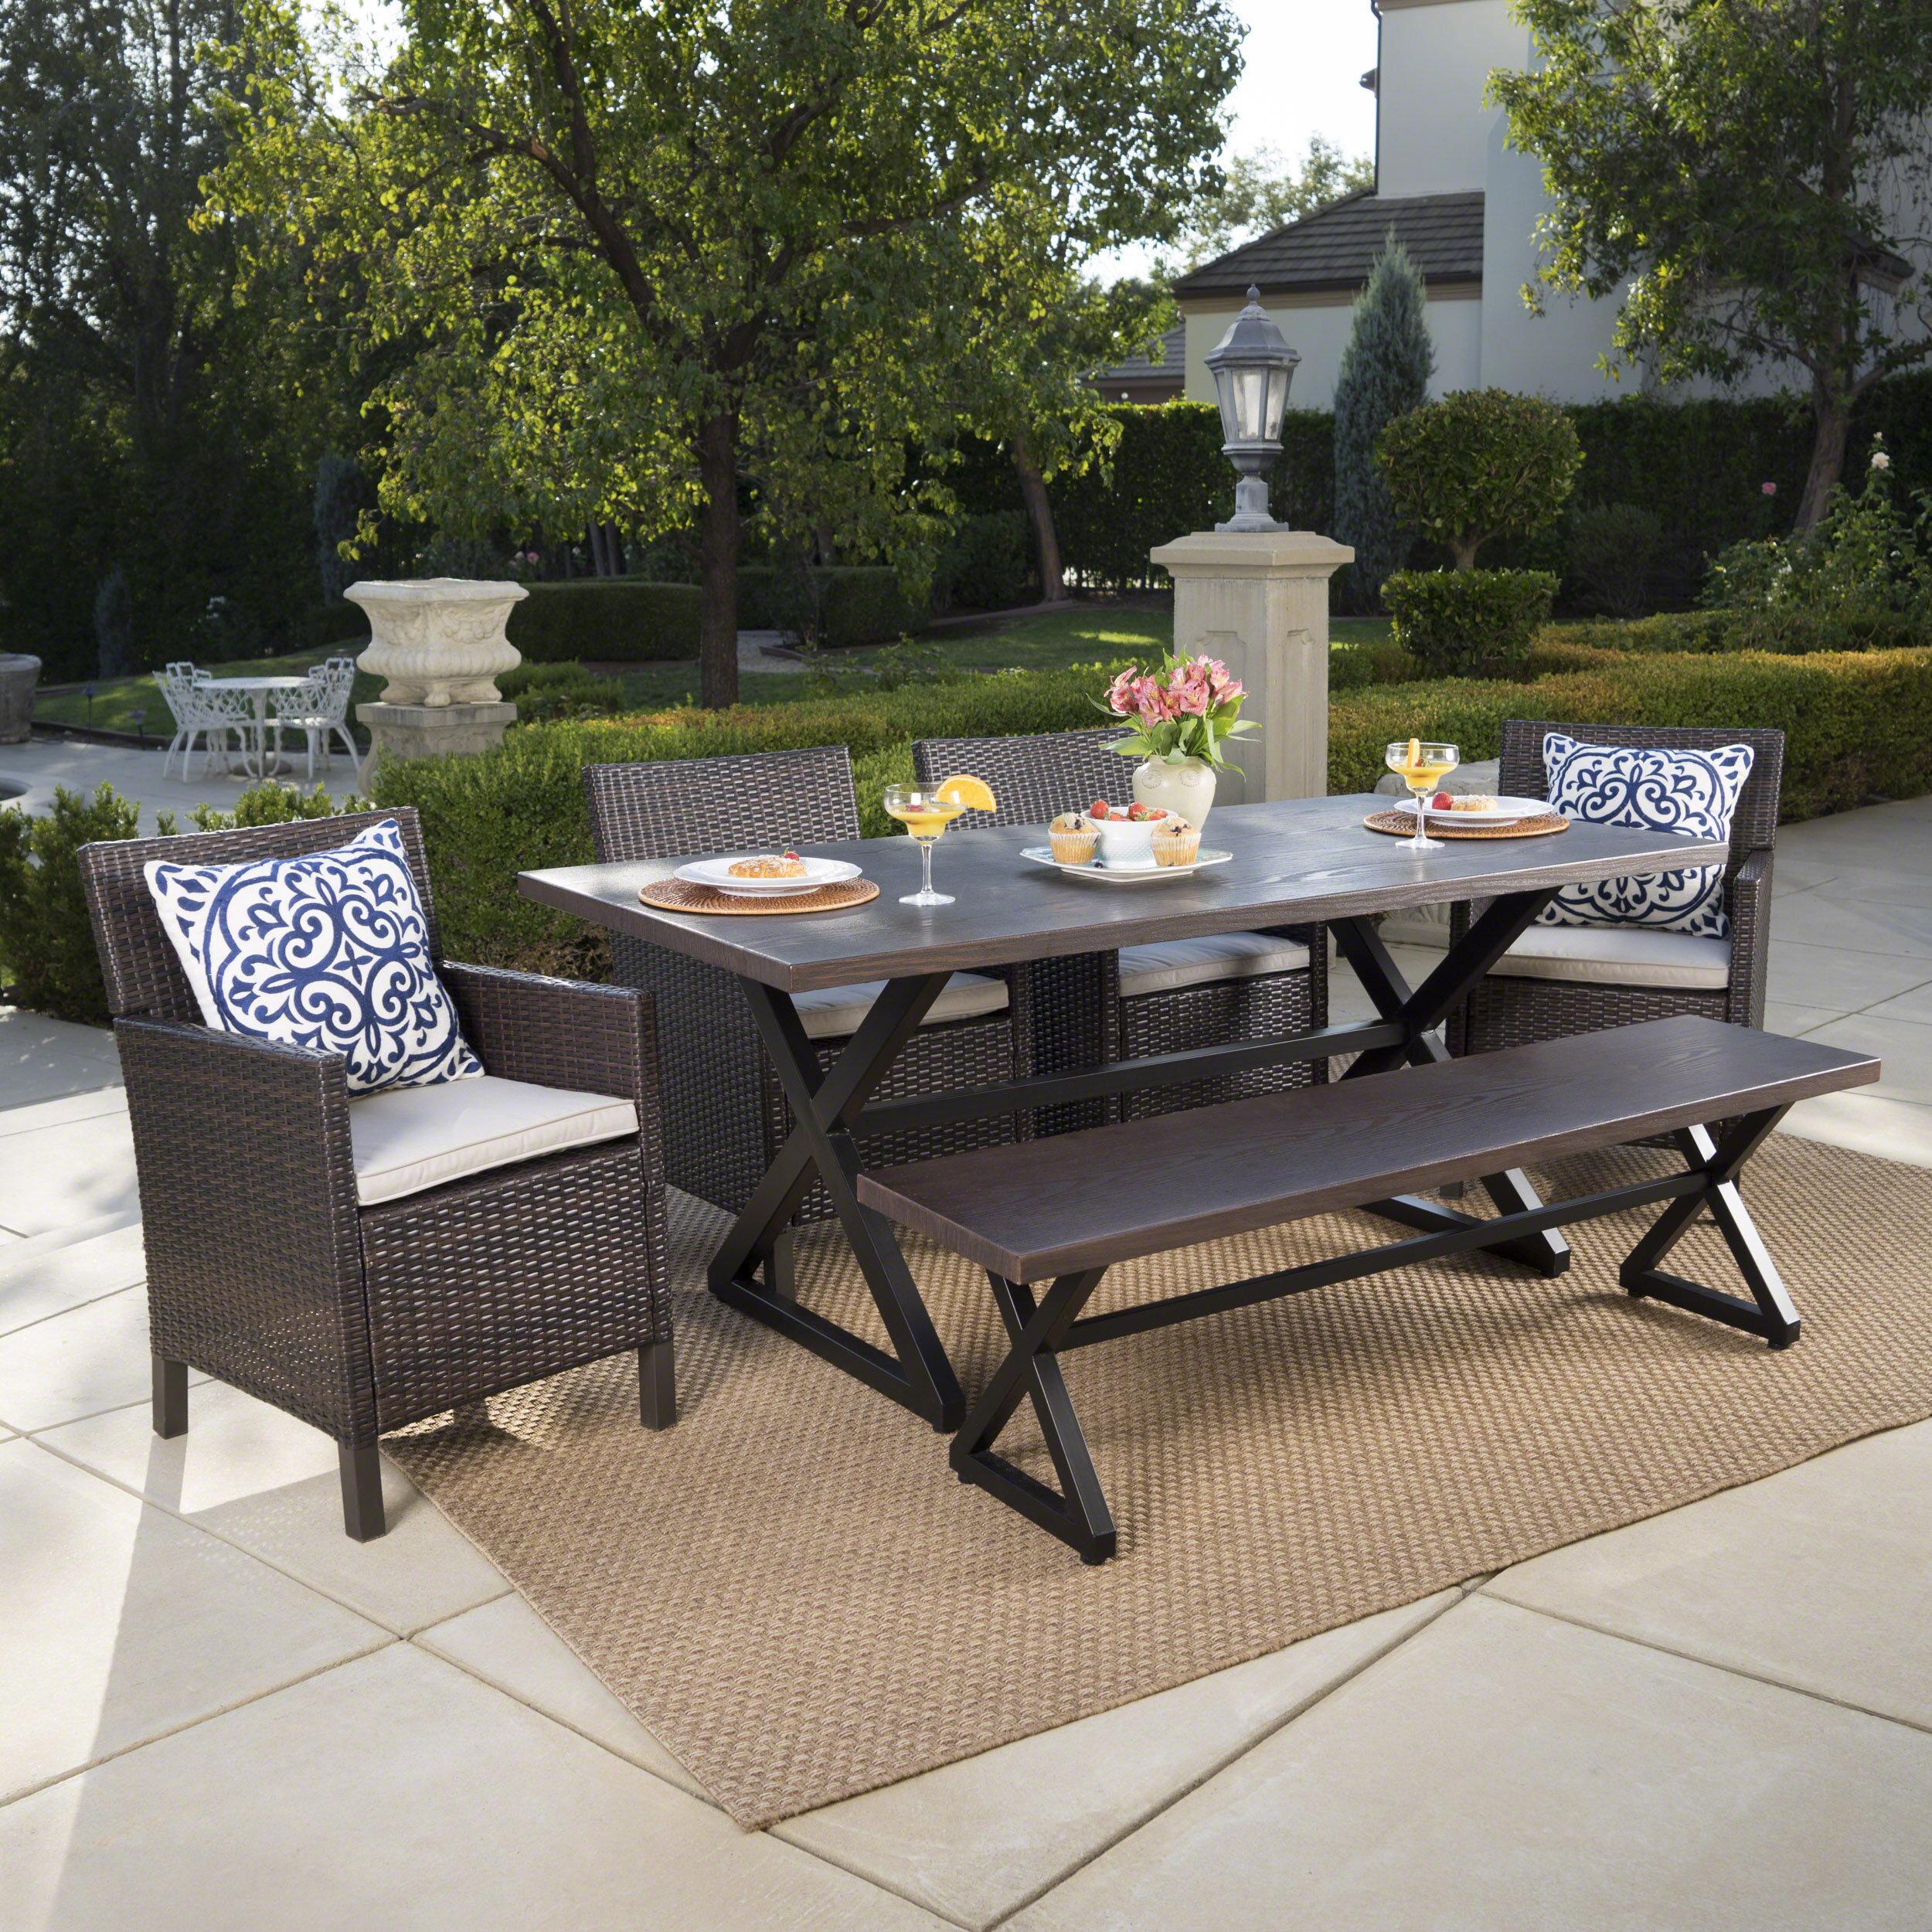 Brayden Studio Sands Outdoor 6 Piece Dining Set With Cushions U0026 Reviews |  Wayfair